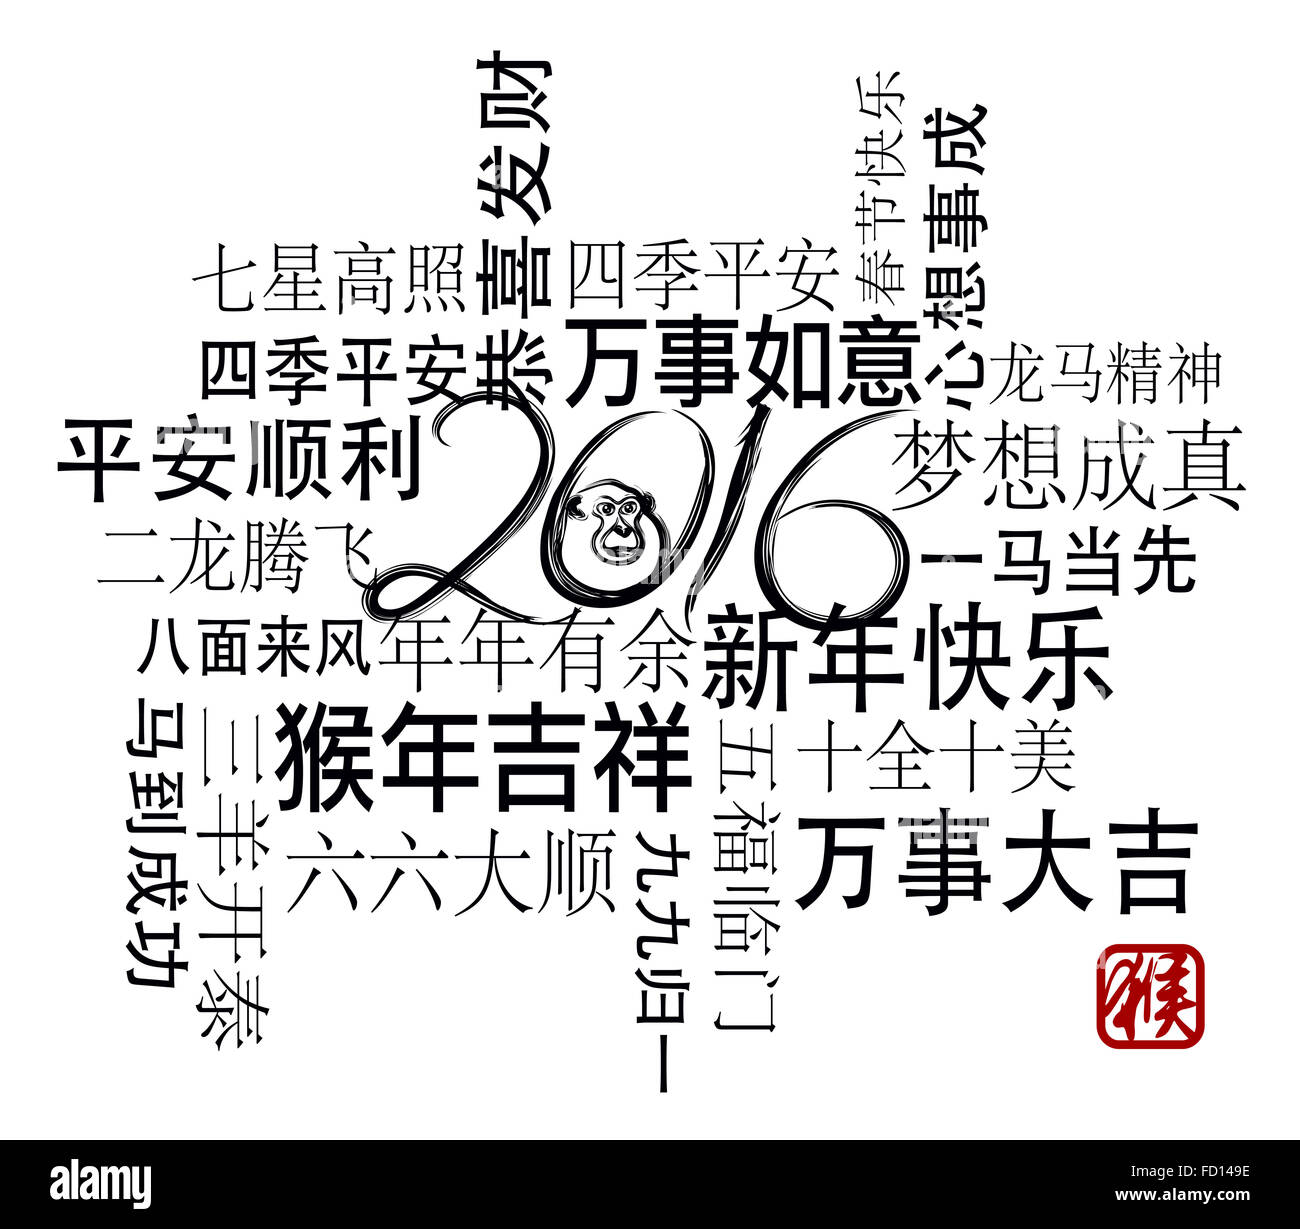 2016 Chinese Lunar New Year Grüße schwarze Tinte BrushText wir ...